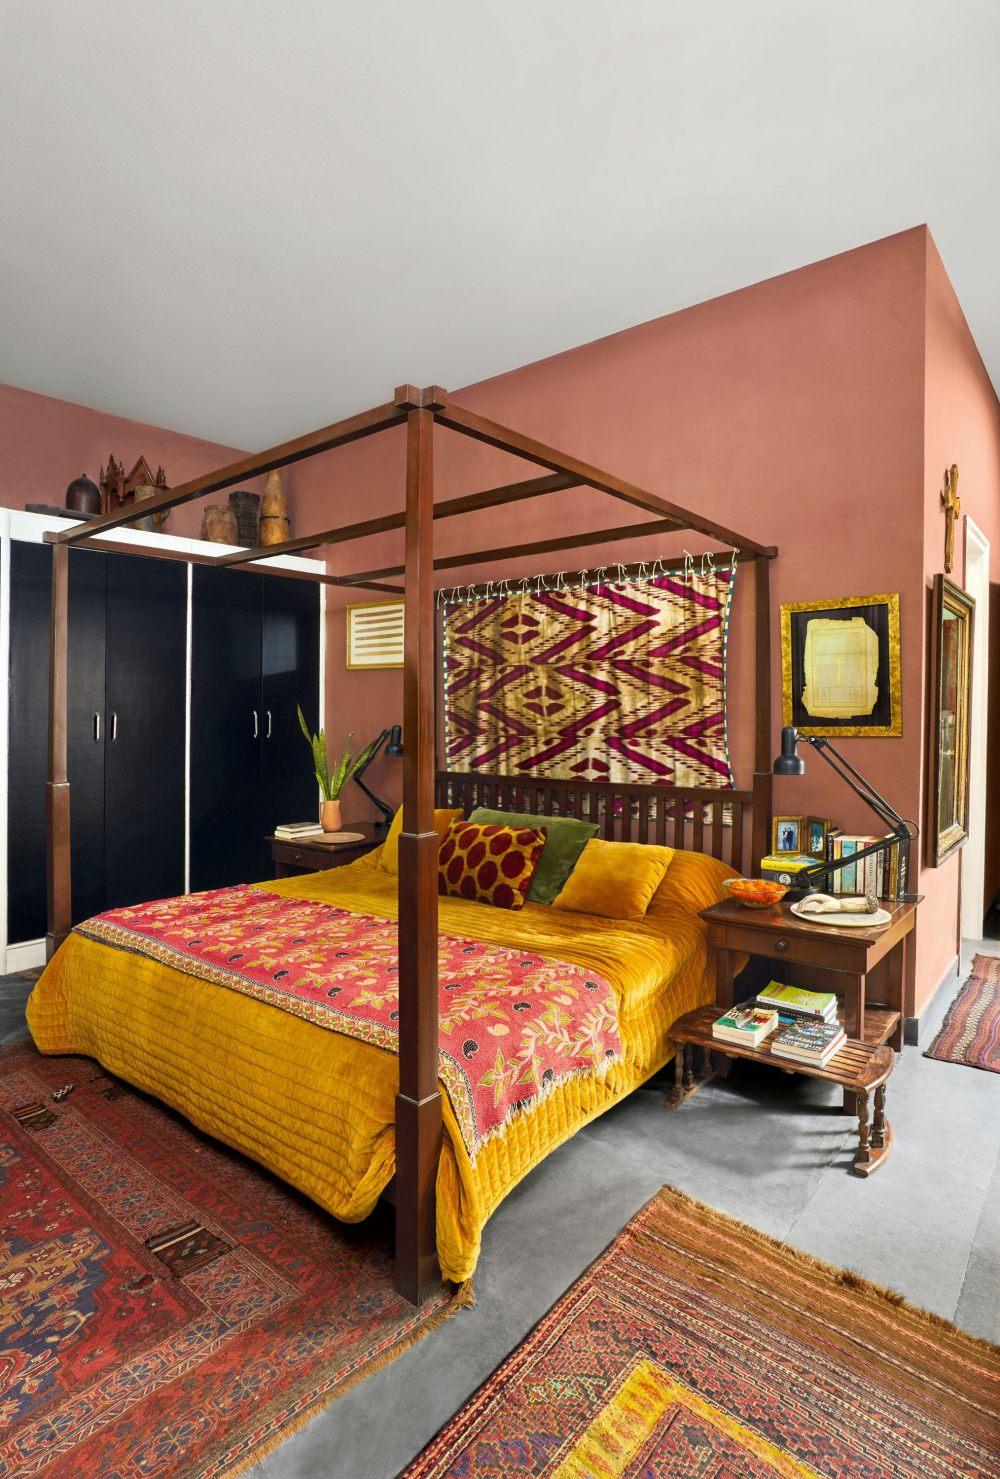 David-abraham-kevin-nigli-delhi-home-photos-4.jpg